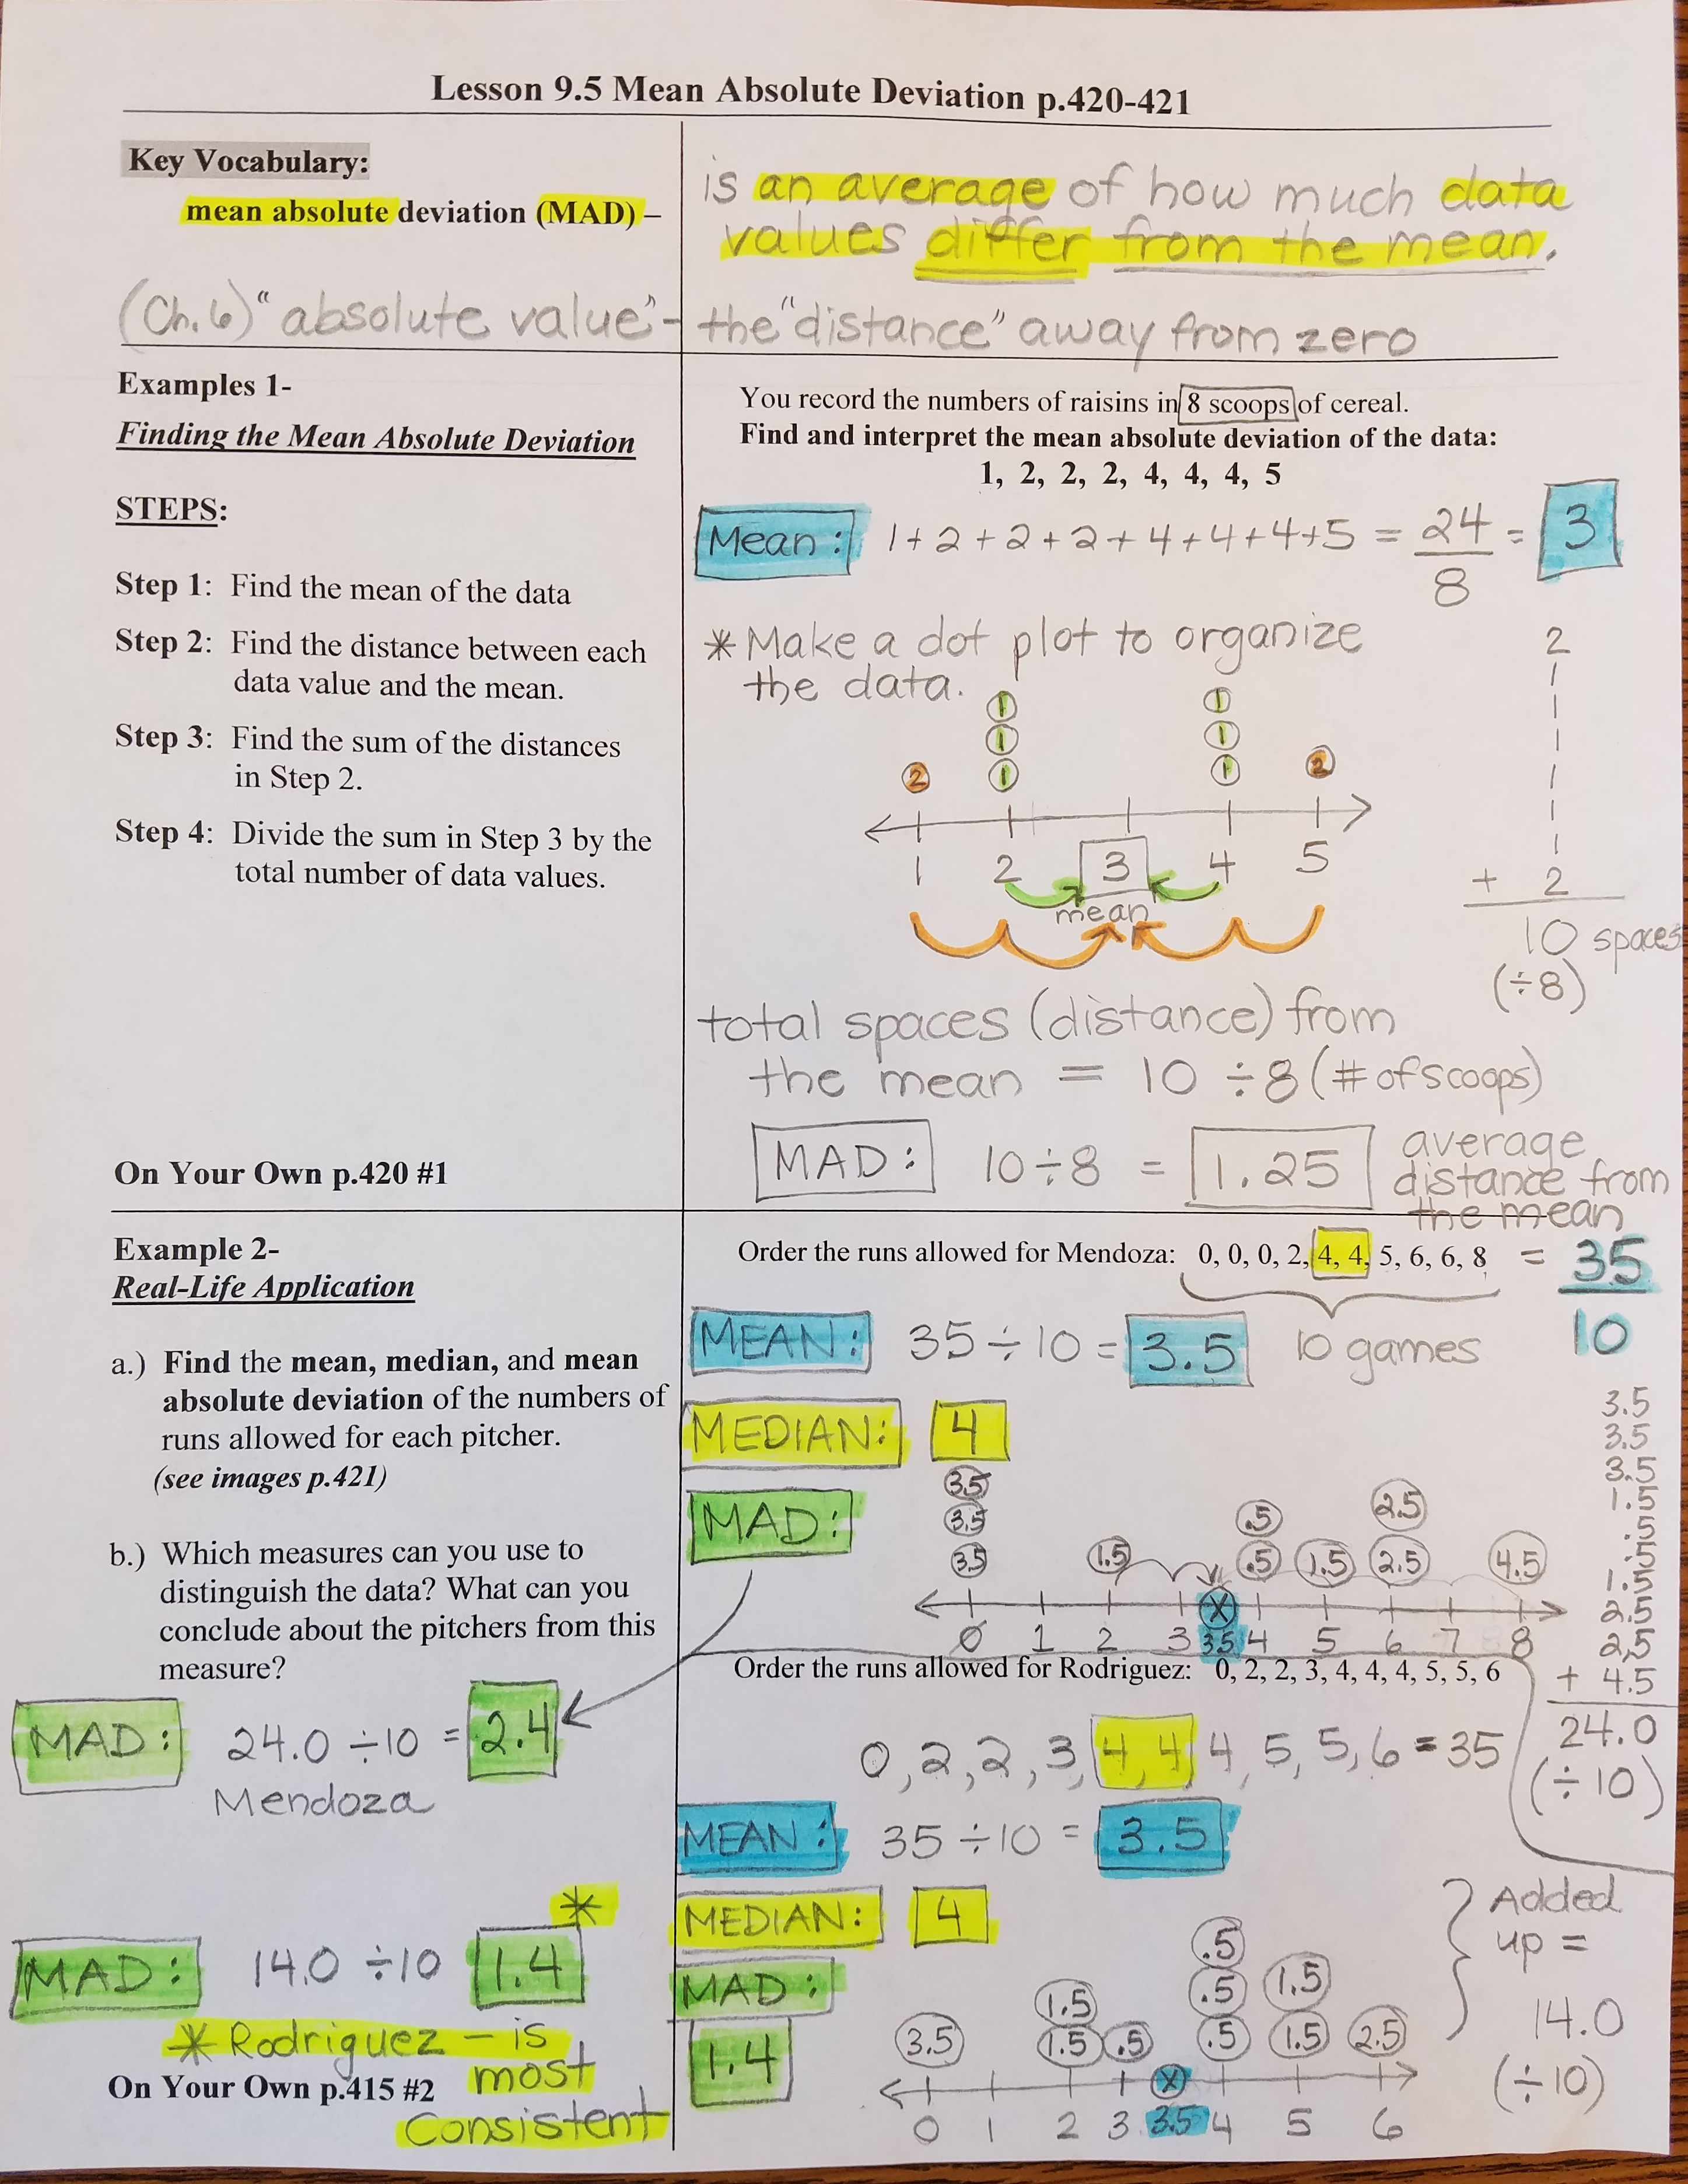 Funky What Do You Get Math Worksheet 16.8 Sketch - General Worksheet ...